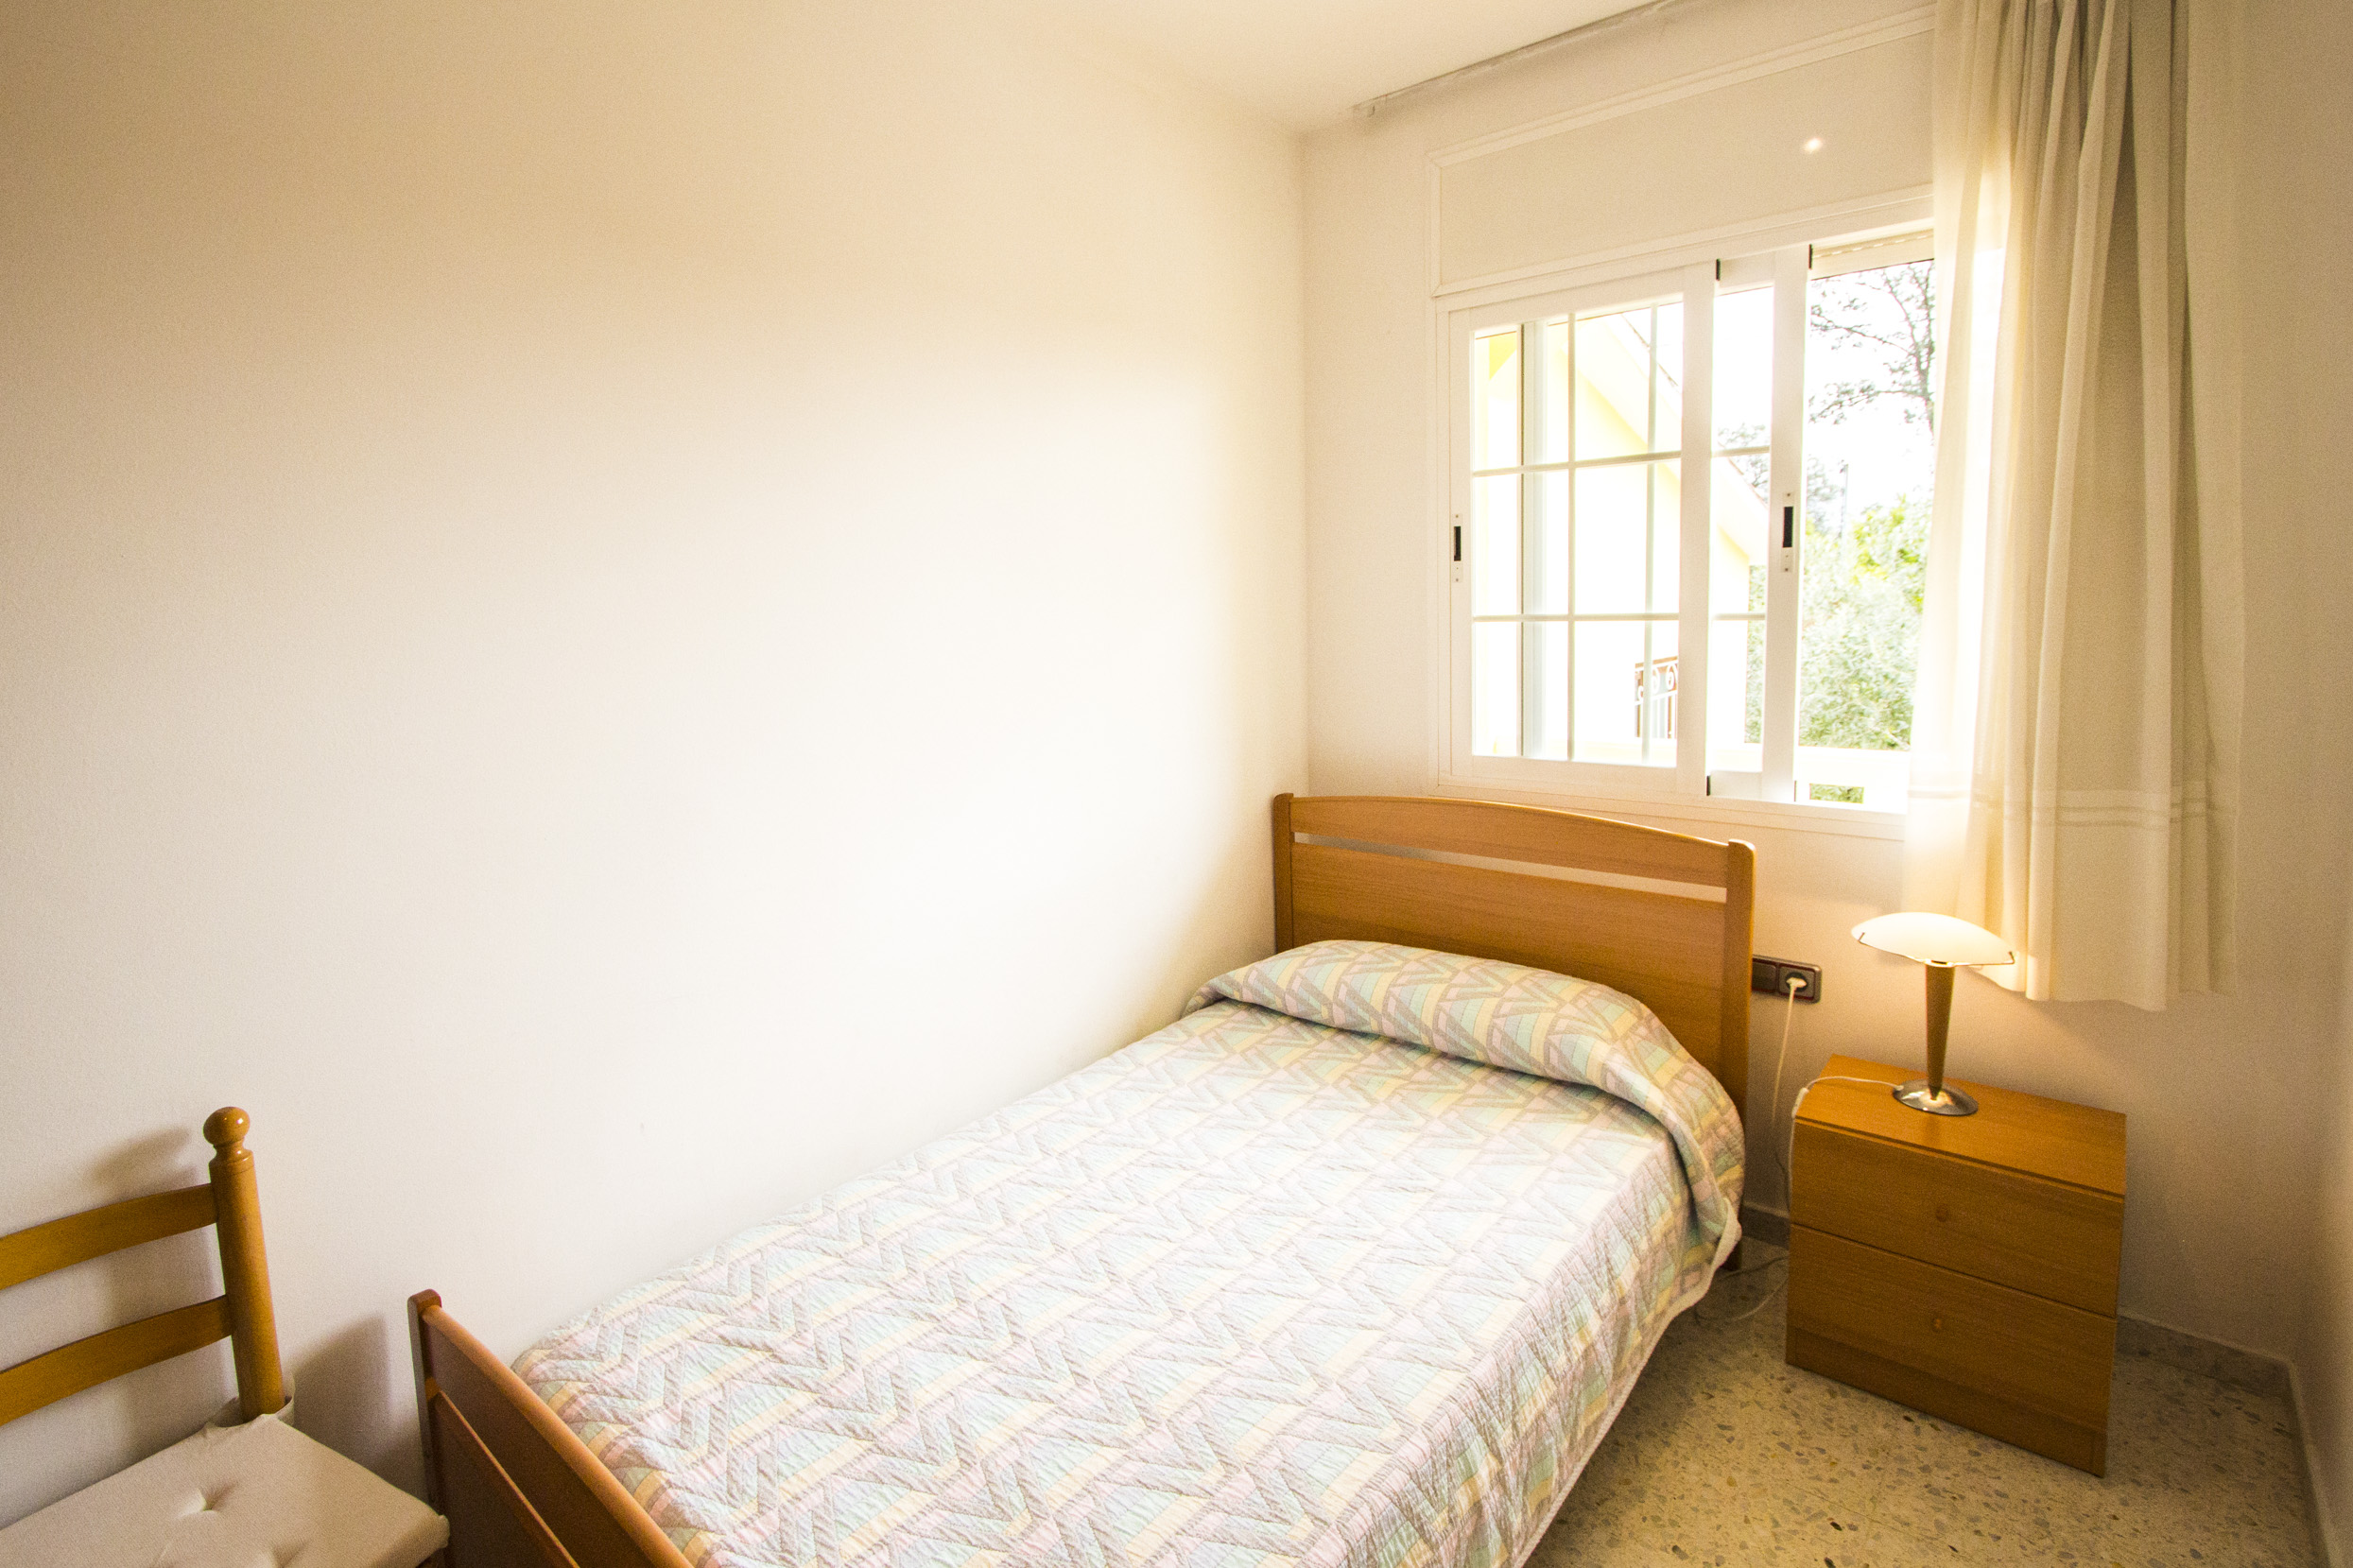 Ferienhaus Catalunya Casas: Peaceful Villa Sils, just 20 km from Costa Brava beaches! (2302155), Les Mallorquines, Girona, Katalonien, Spanien, Bild 22